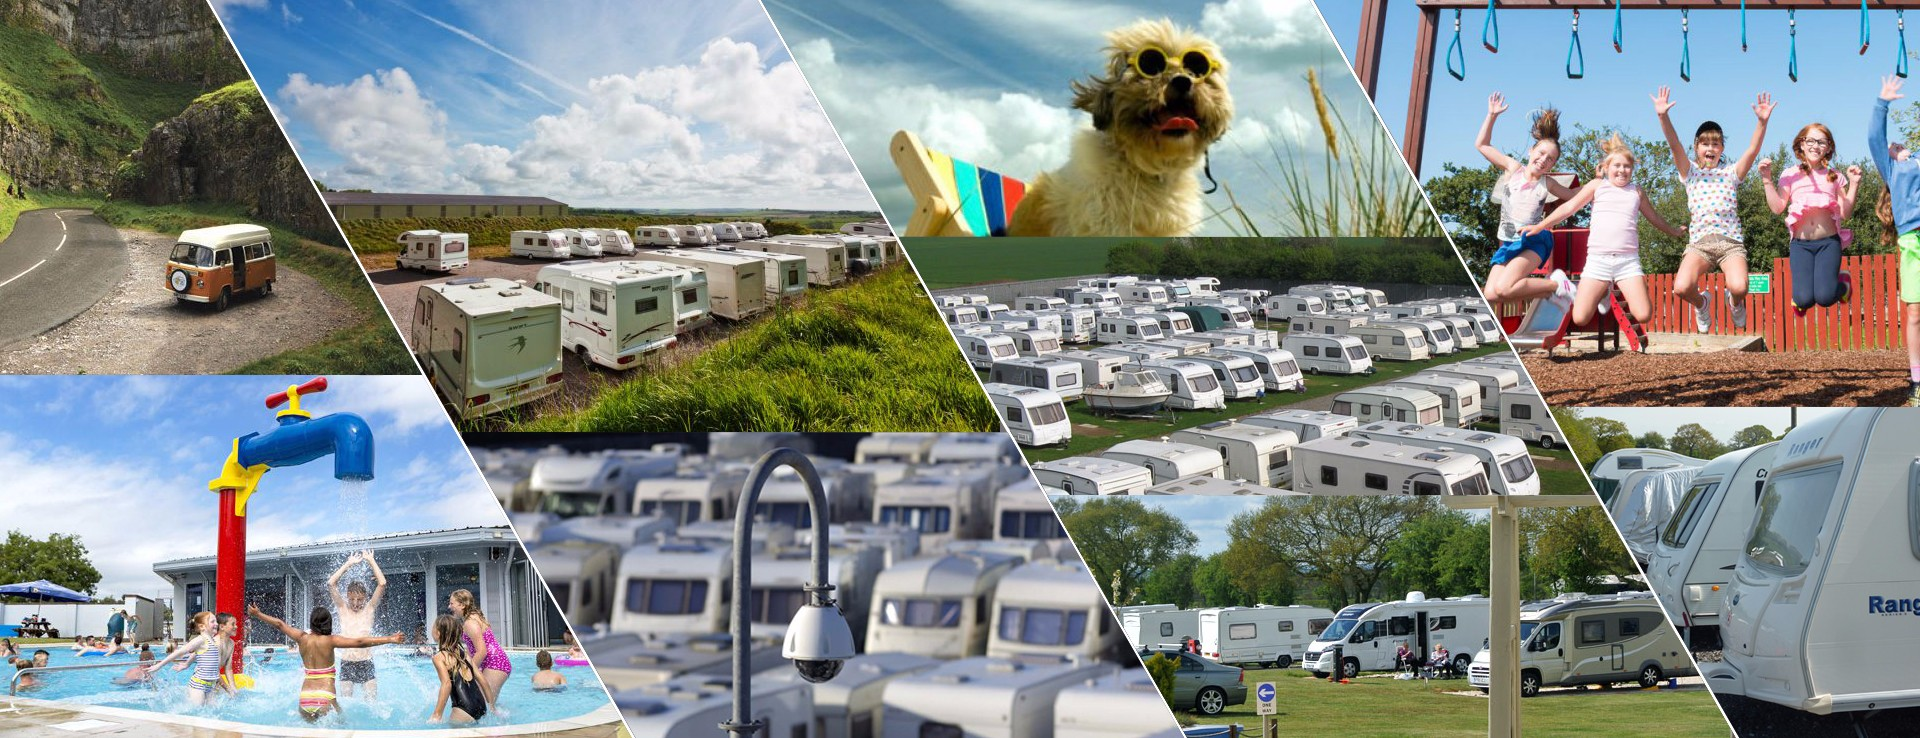 20 Top Caravan Storage Sites In The Uk Camplify